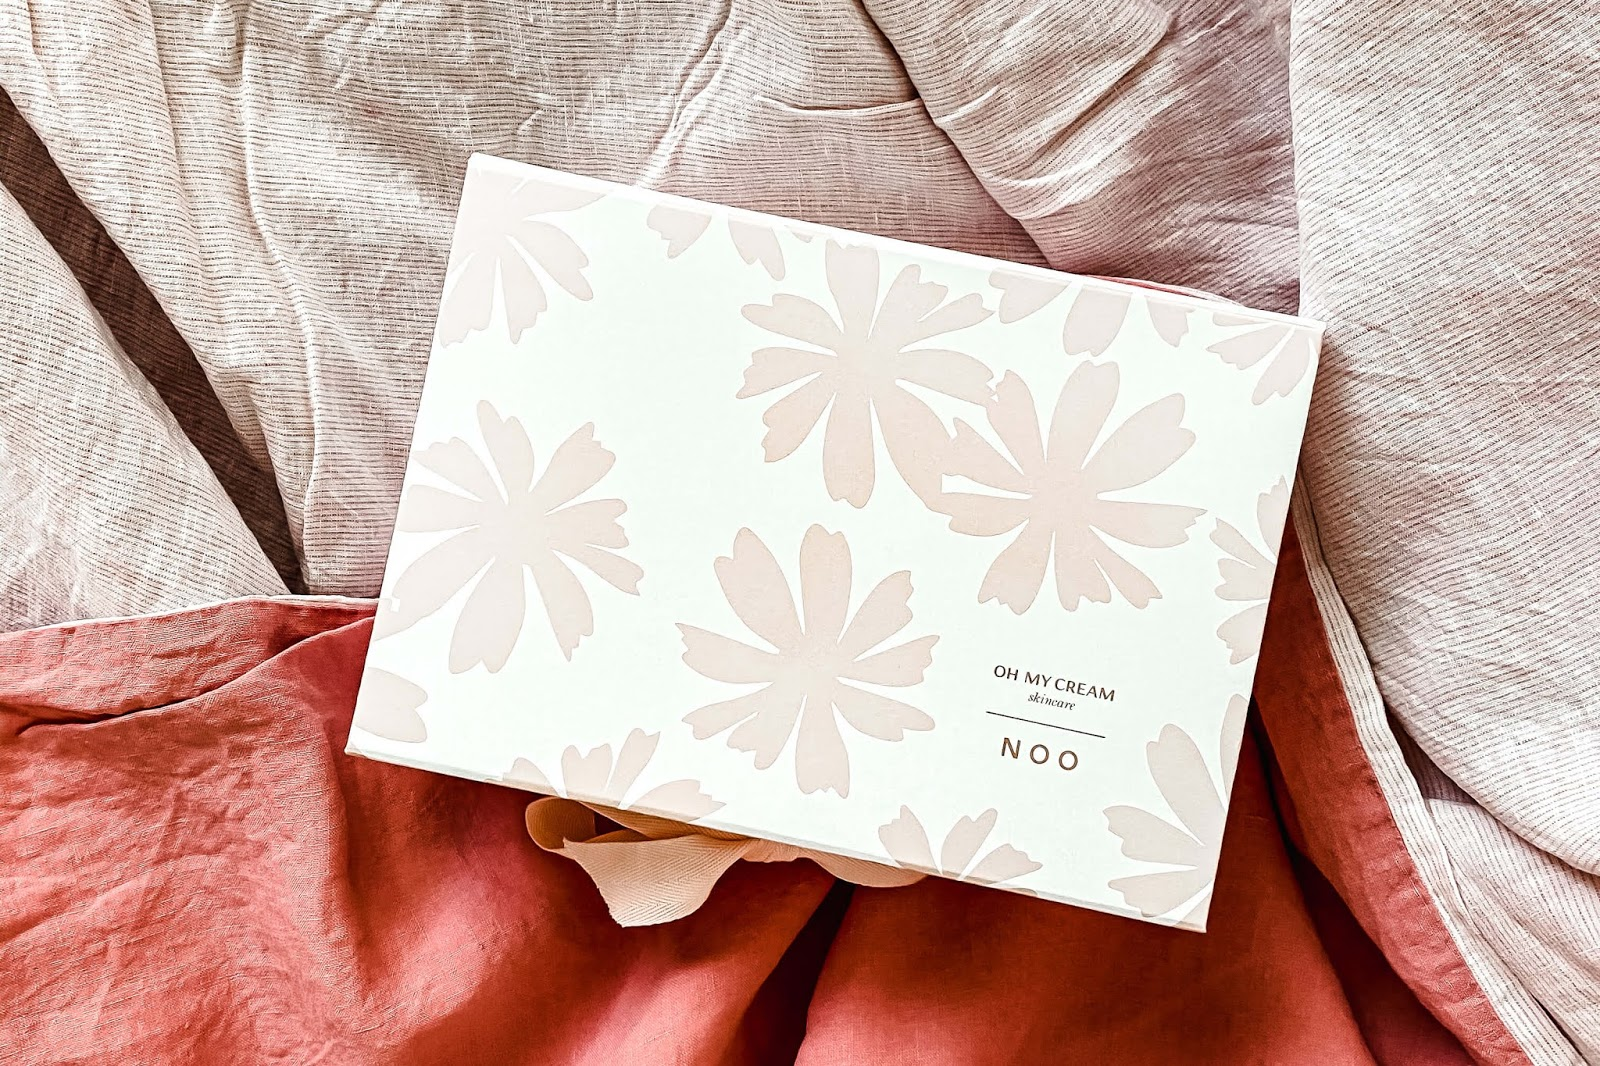 Oh My Cream Coffret Baume de Nuit Kimono Noo avis